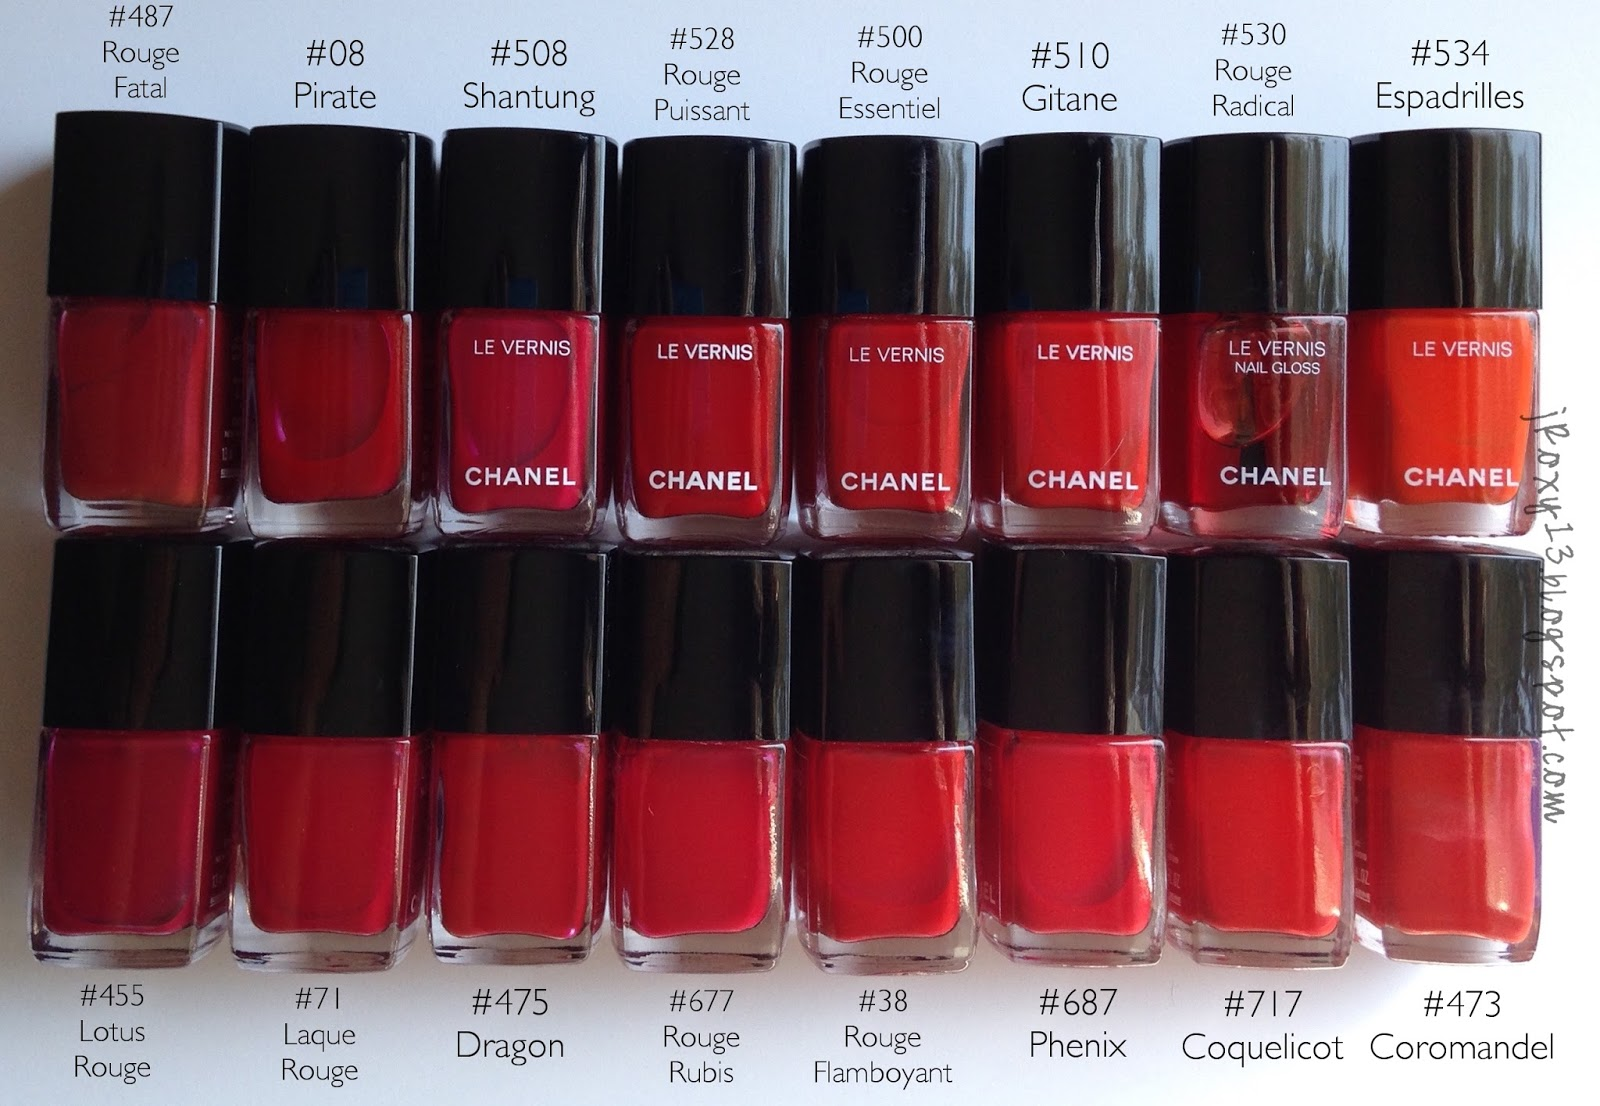 Chanel In 500 Rouge Essentiel Comparisons